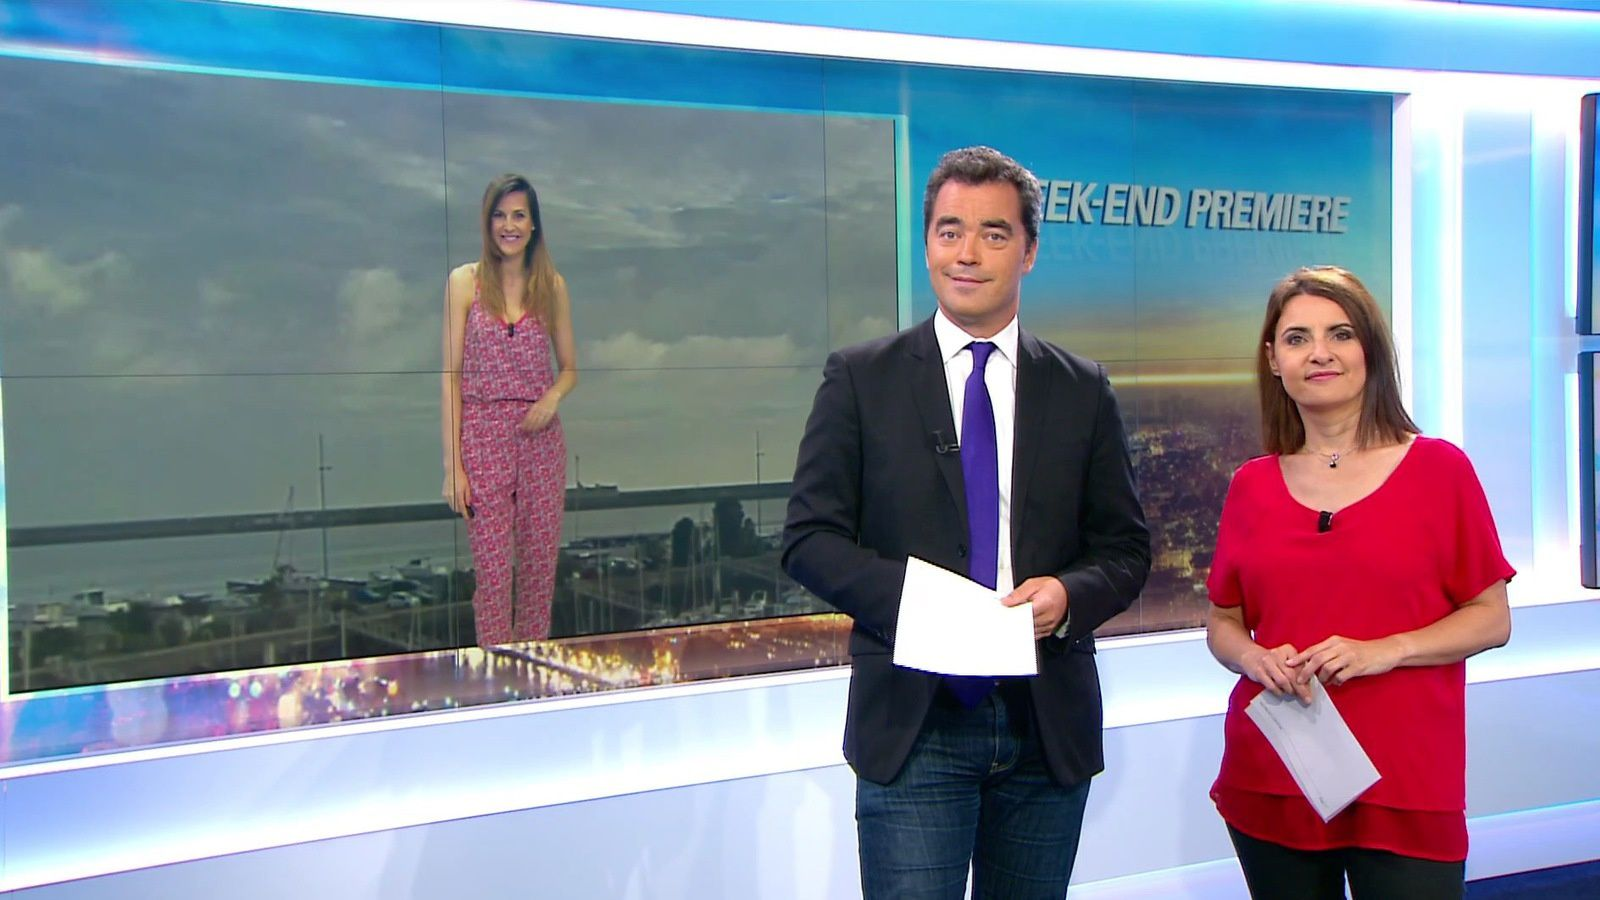 📸13 WEEK-END PREMIERE @BFMTV @BFMTVmatinaleWE @SandraGandoin @JohannaCarlosD8 ce matin #vuesalatele